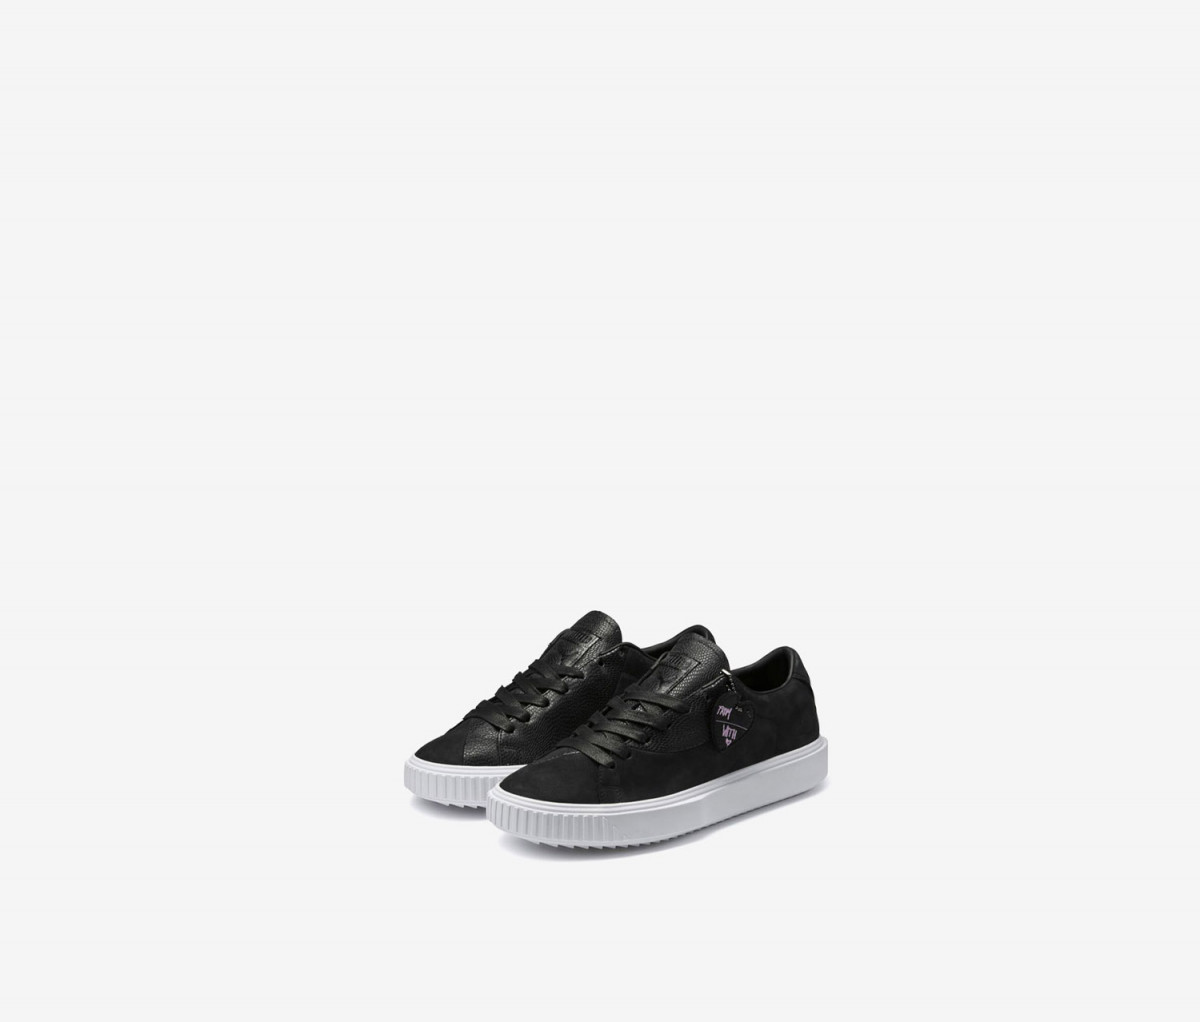 Puma Breaker Valentine FM Unisex Sportstyle Shoes  Black